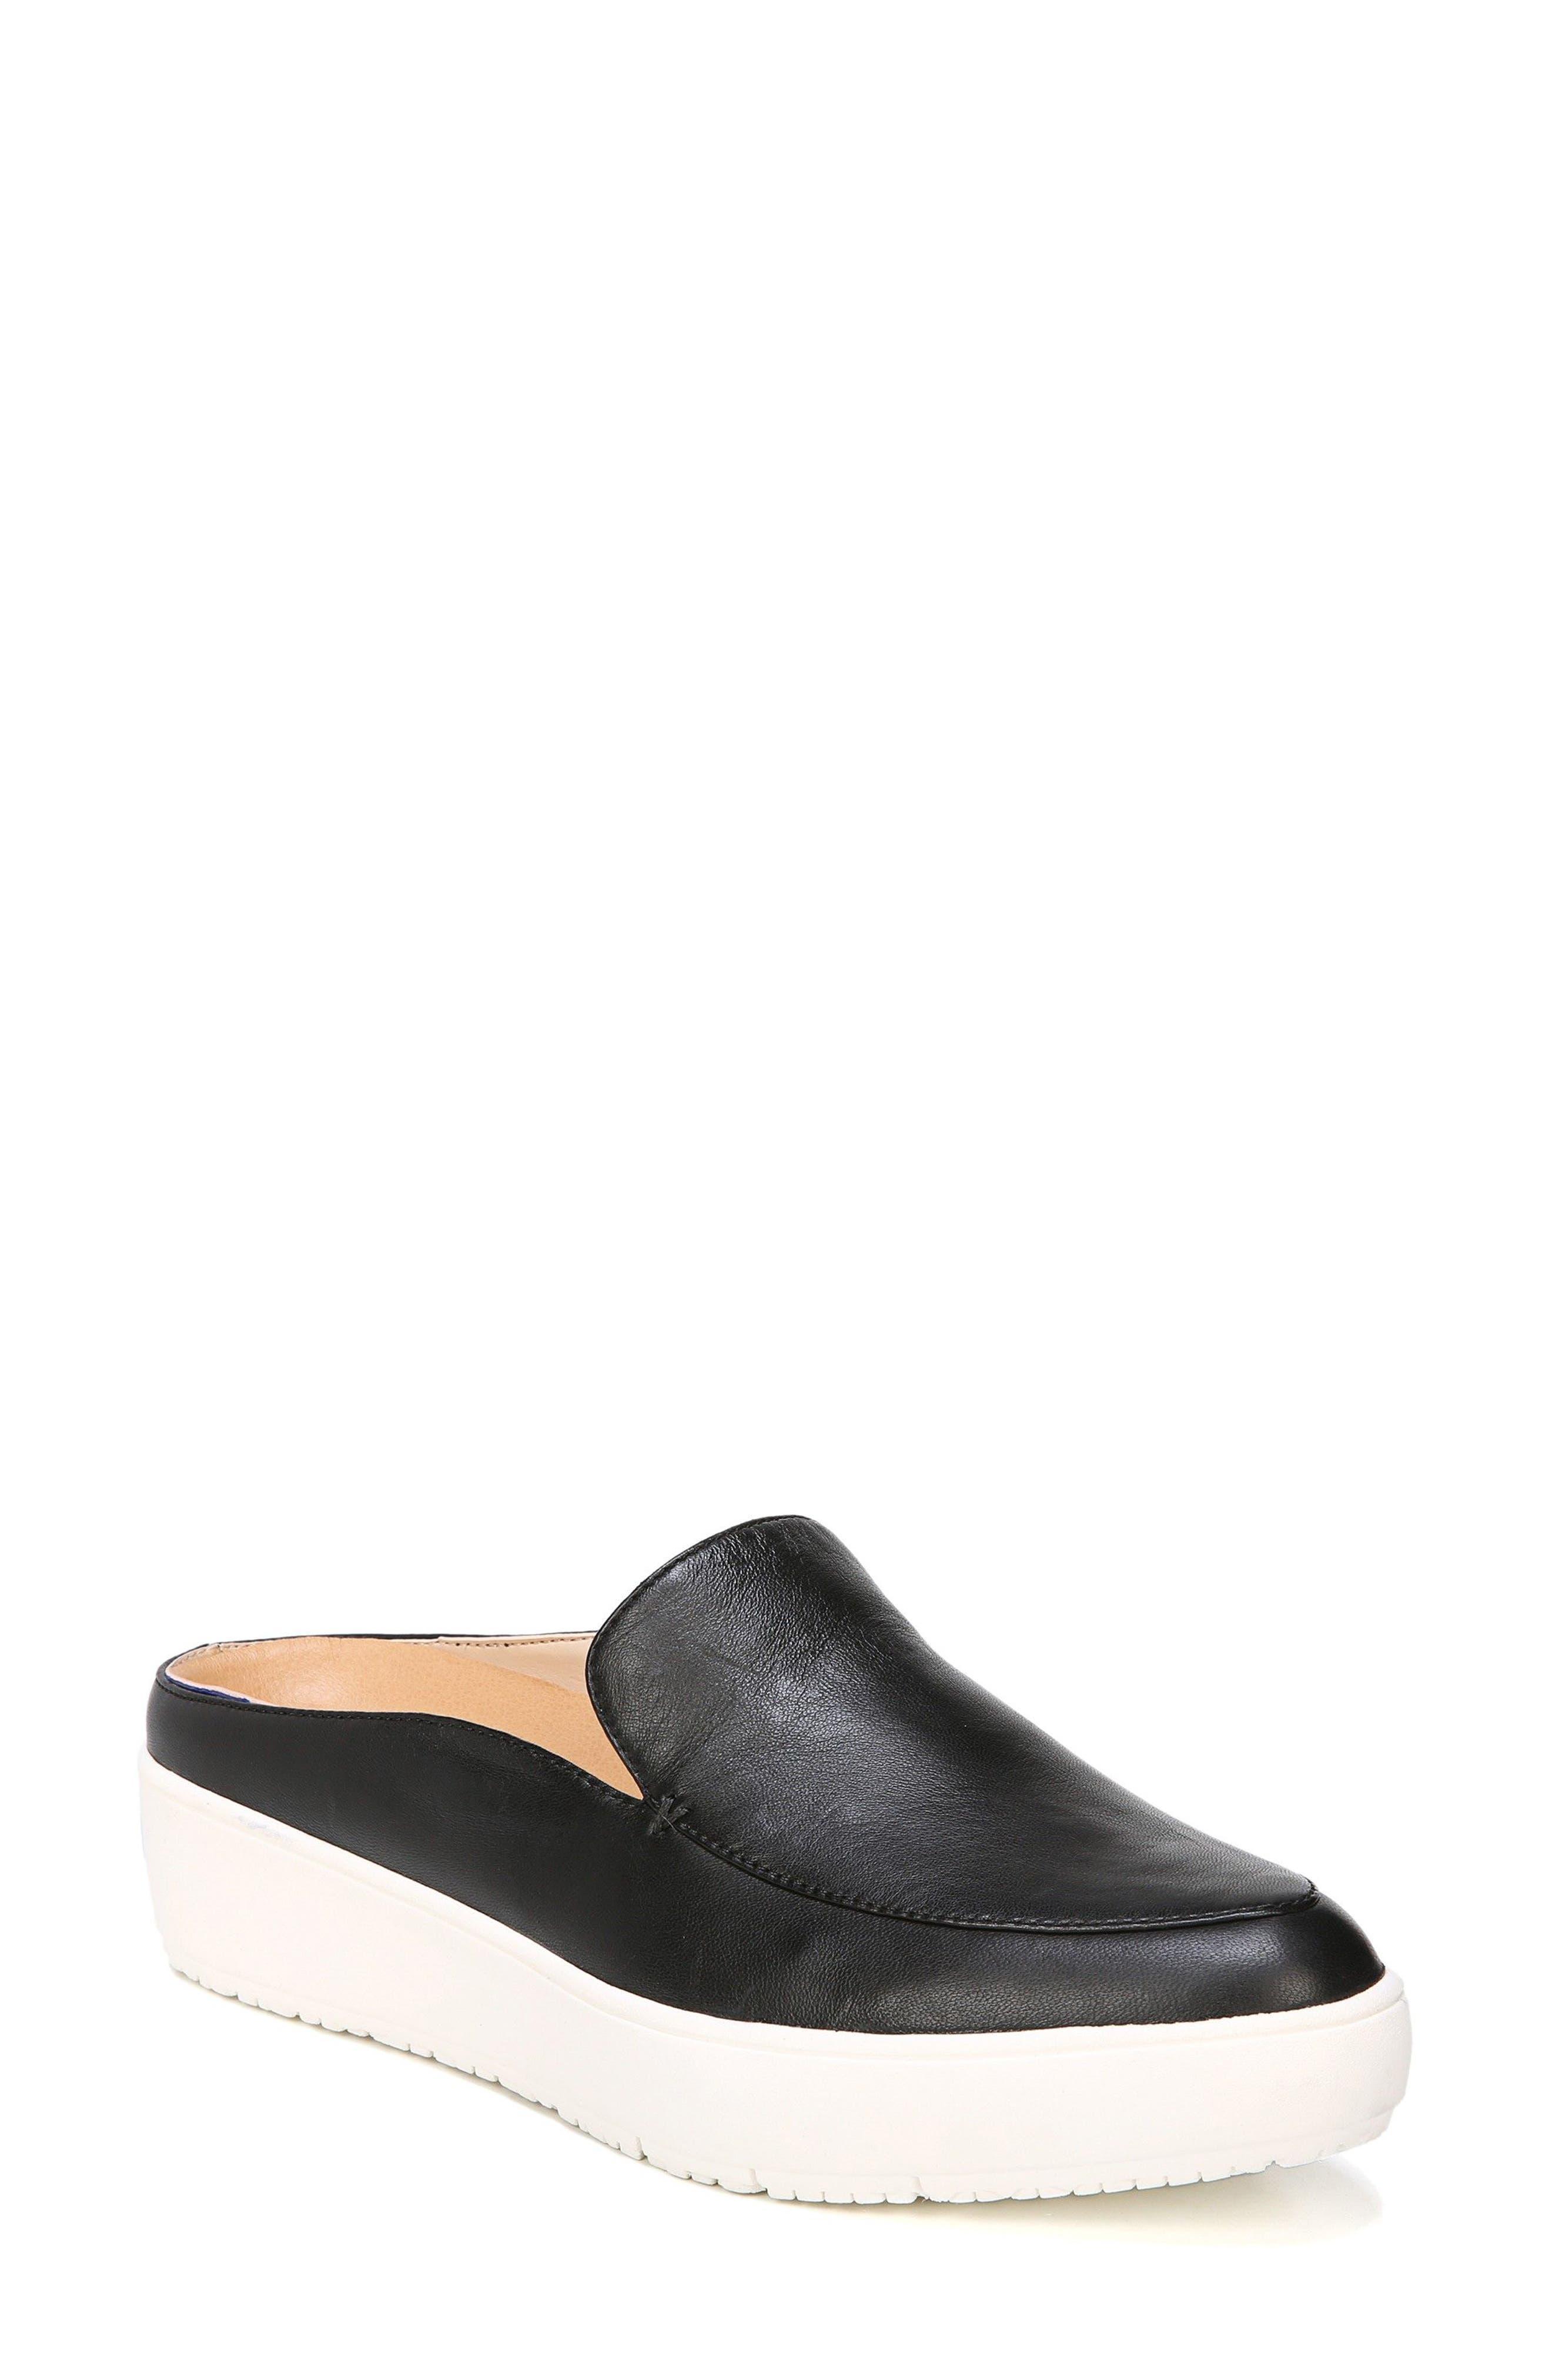 Gia Mule,                         Main,                         color, Black Leather